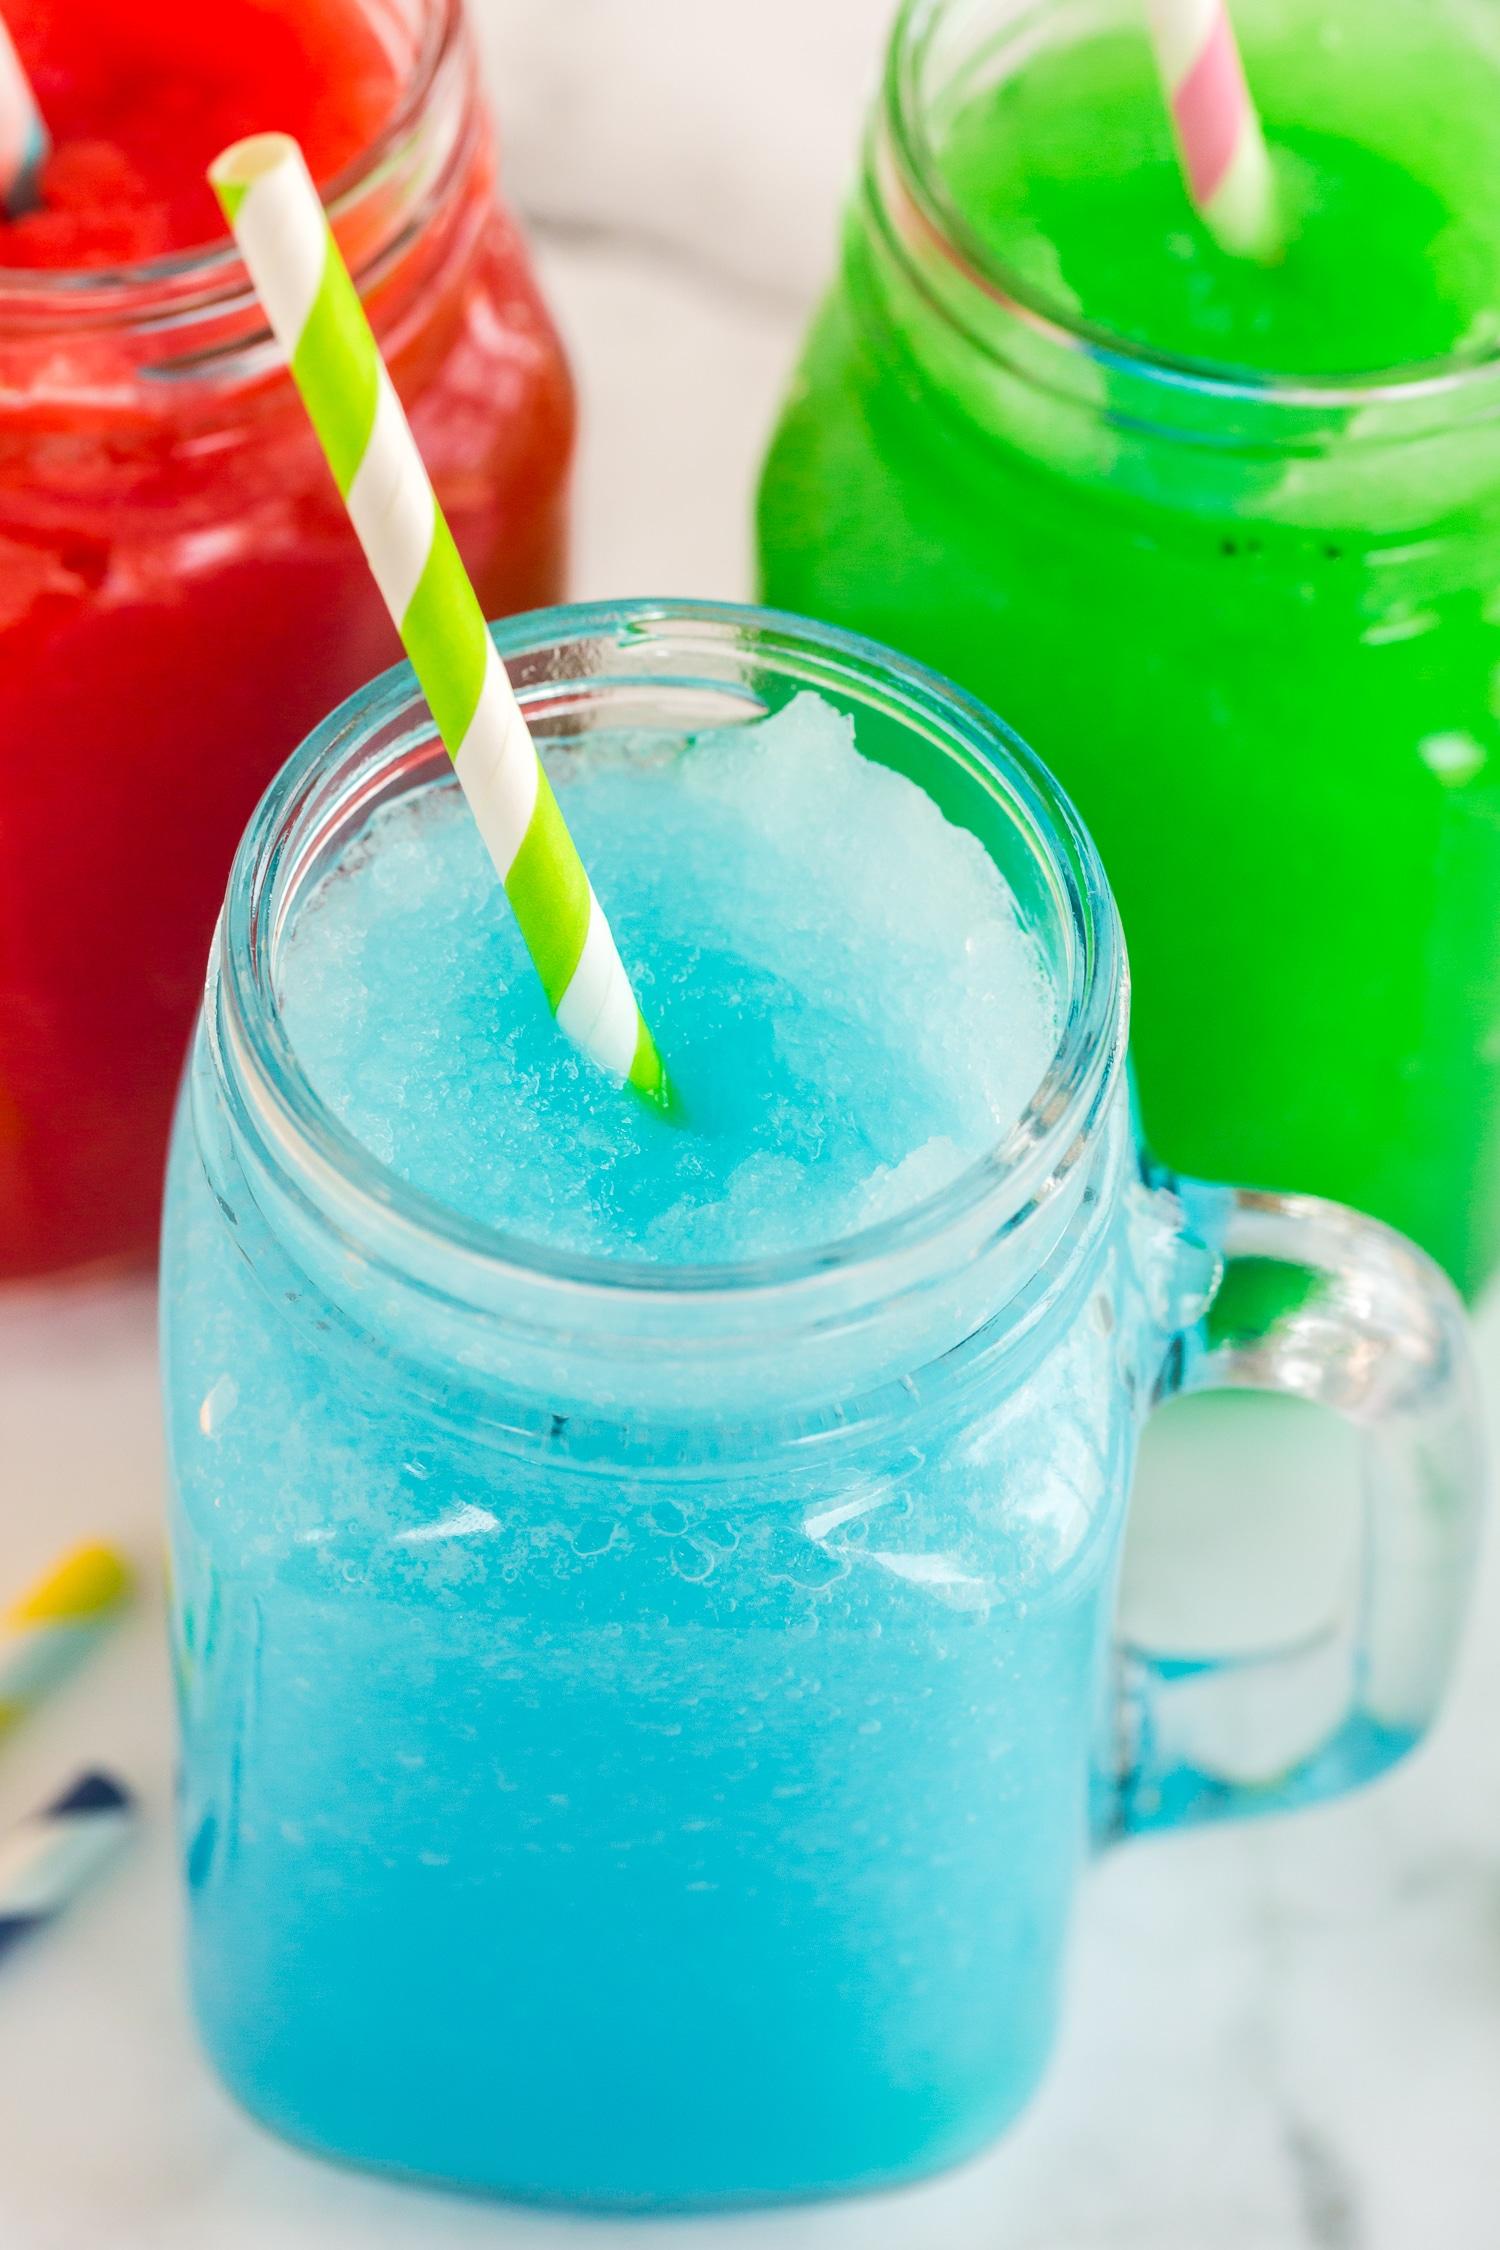 close up of blue slushie in mason jar with green straw